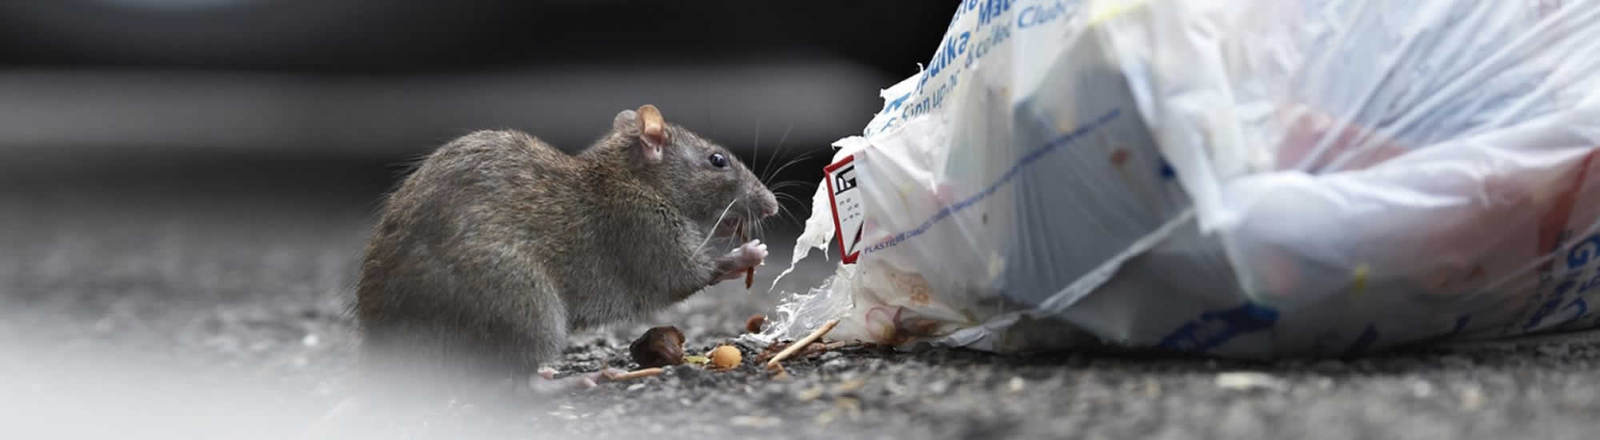 rat pest control in Essex & Suffolk